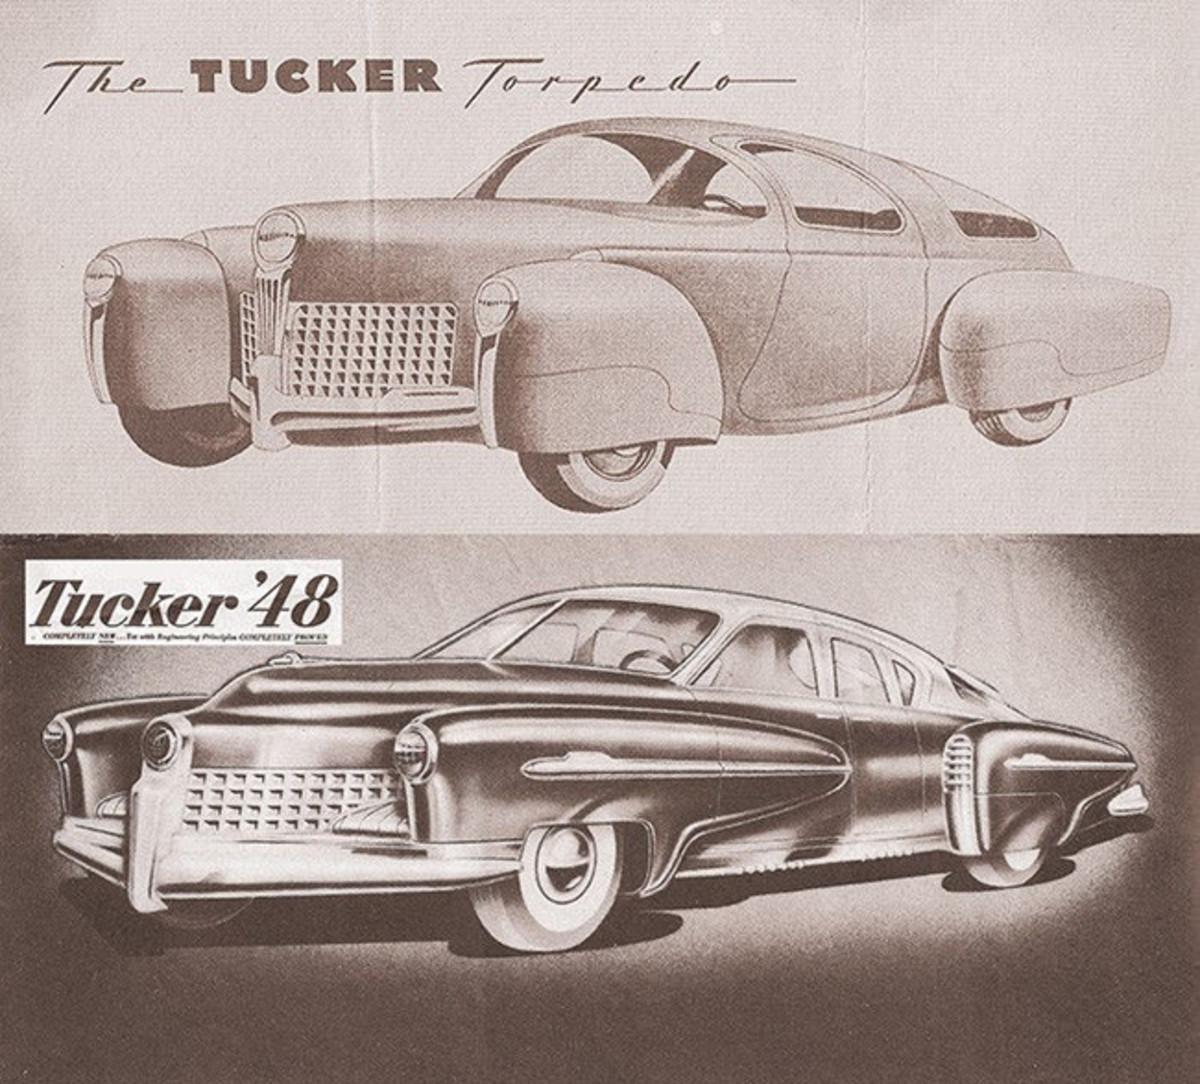 Image credit: Tucker Design History Files, Gyronautx1.com